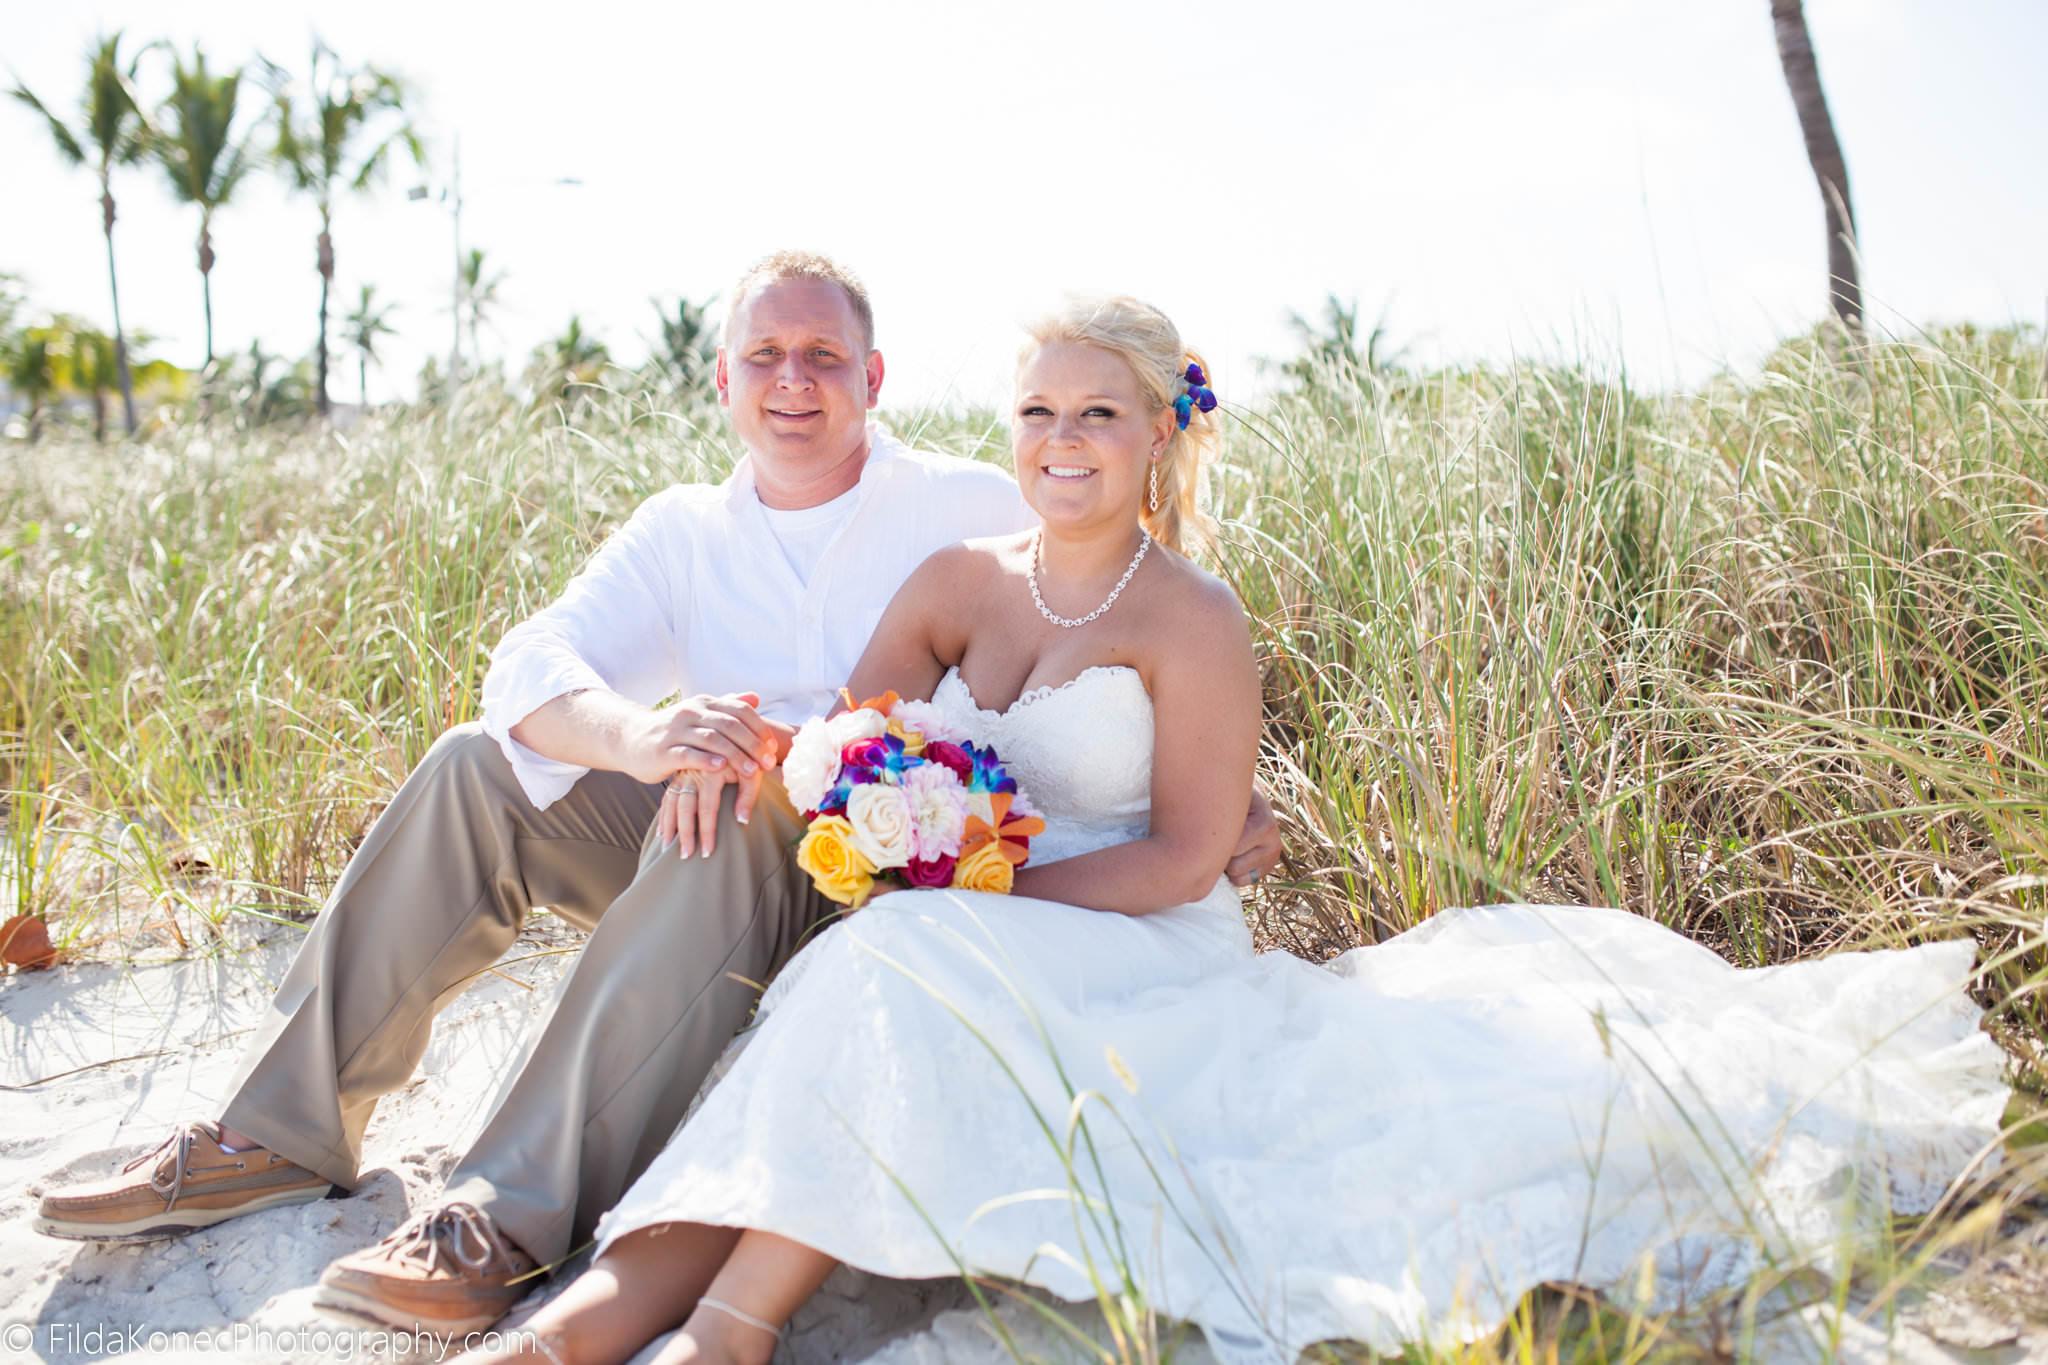 ASHLEY + CORY | SMATHERS BEACH KEY WEST WEDDINGS